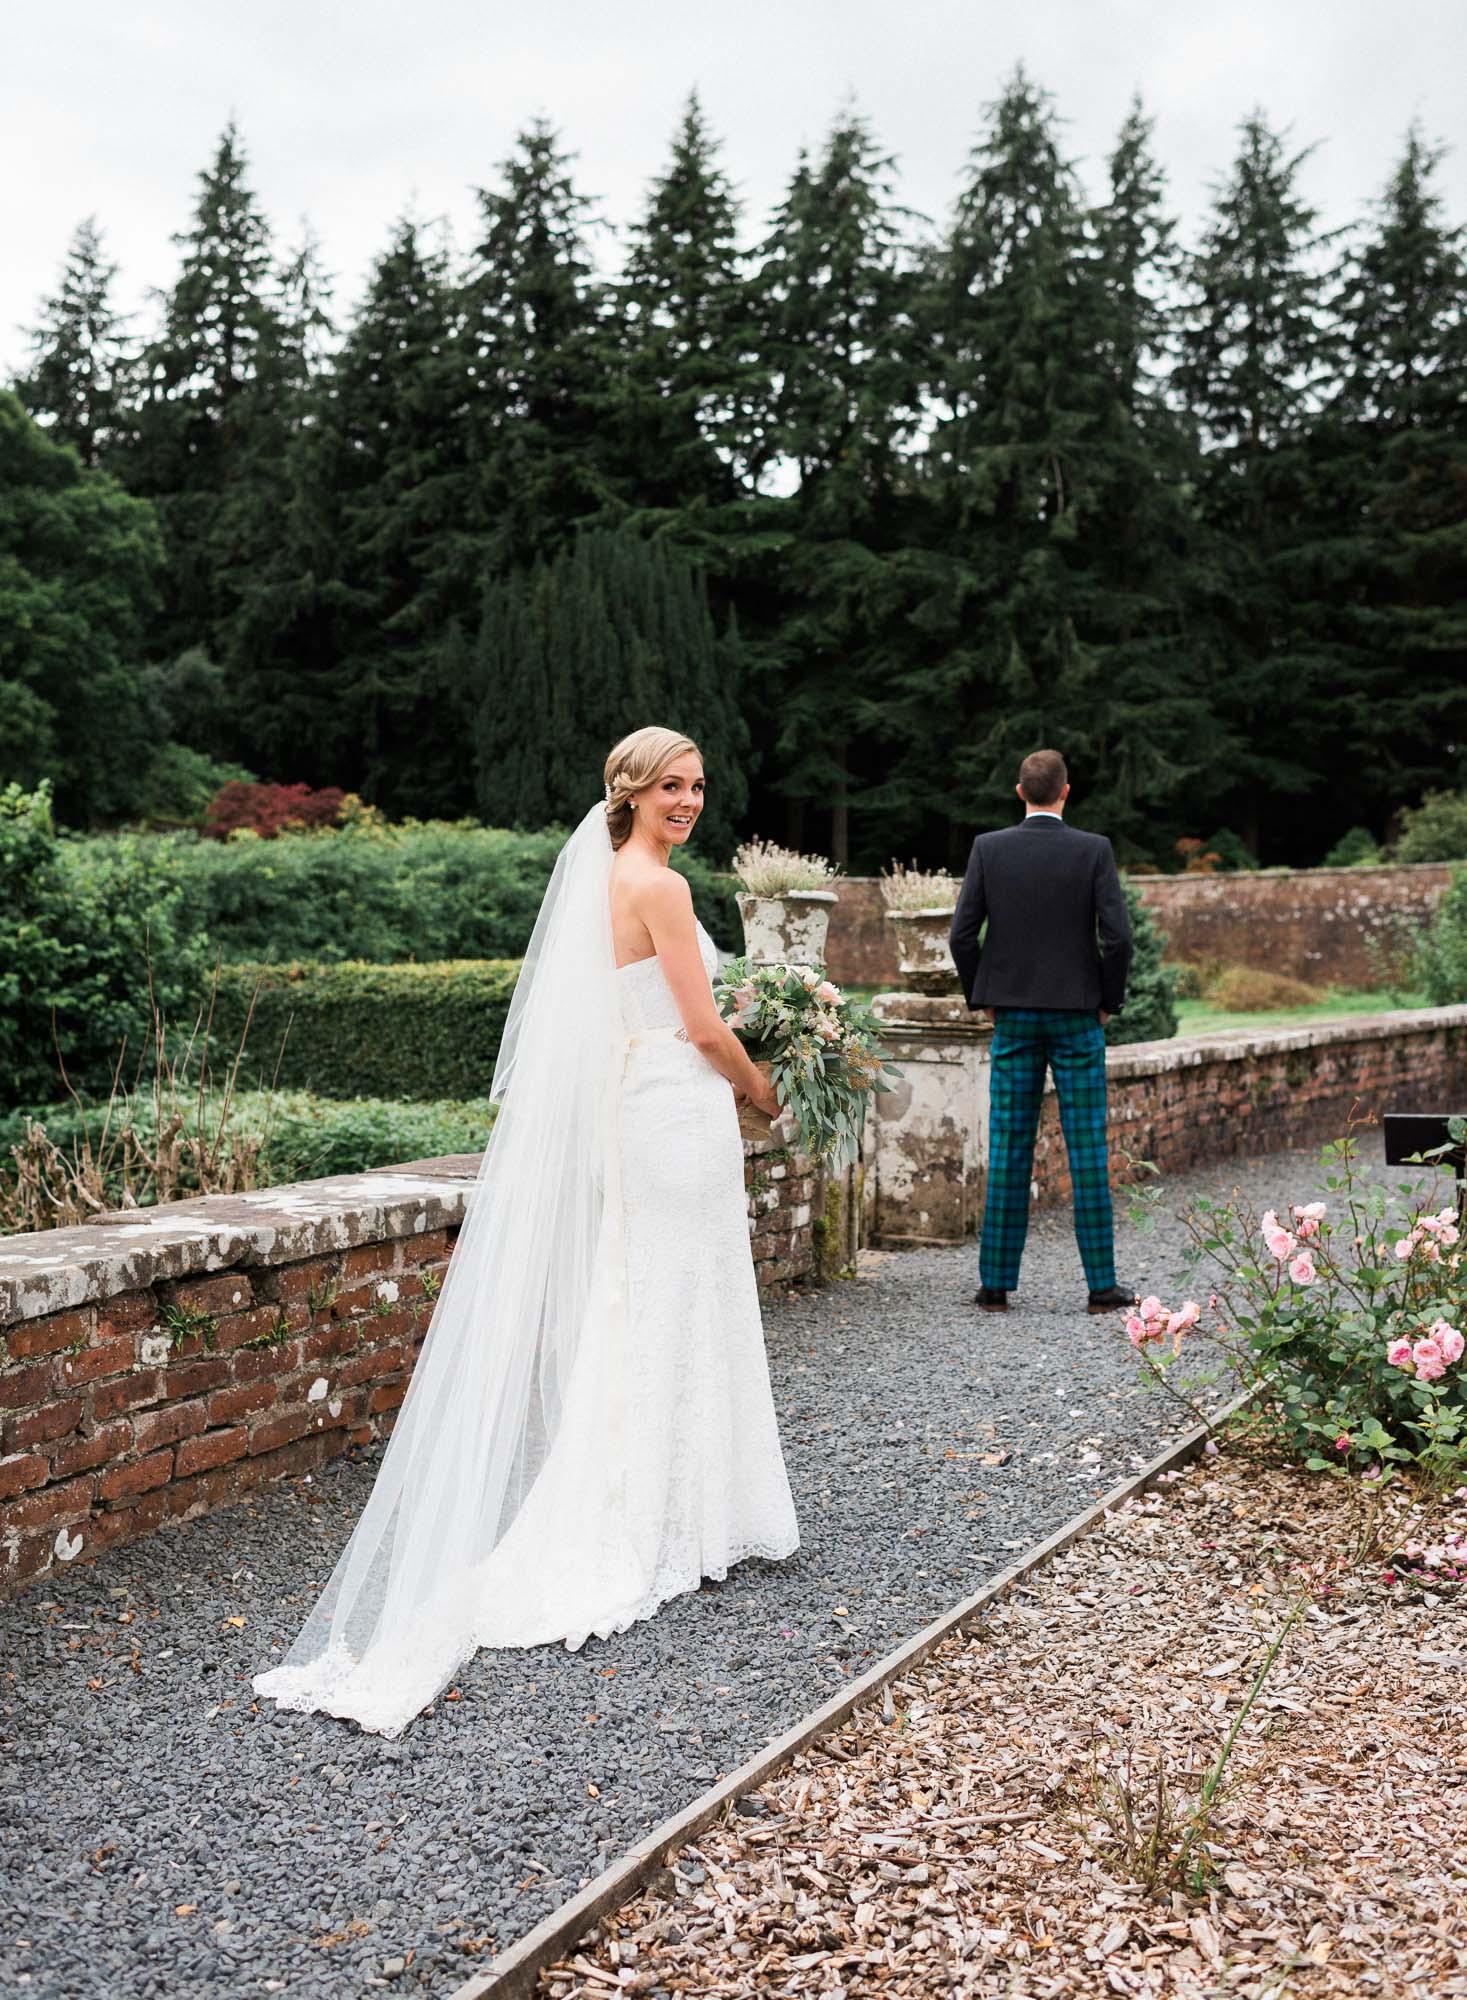 scottish_wedding_blairquhan_castle-41.jpg